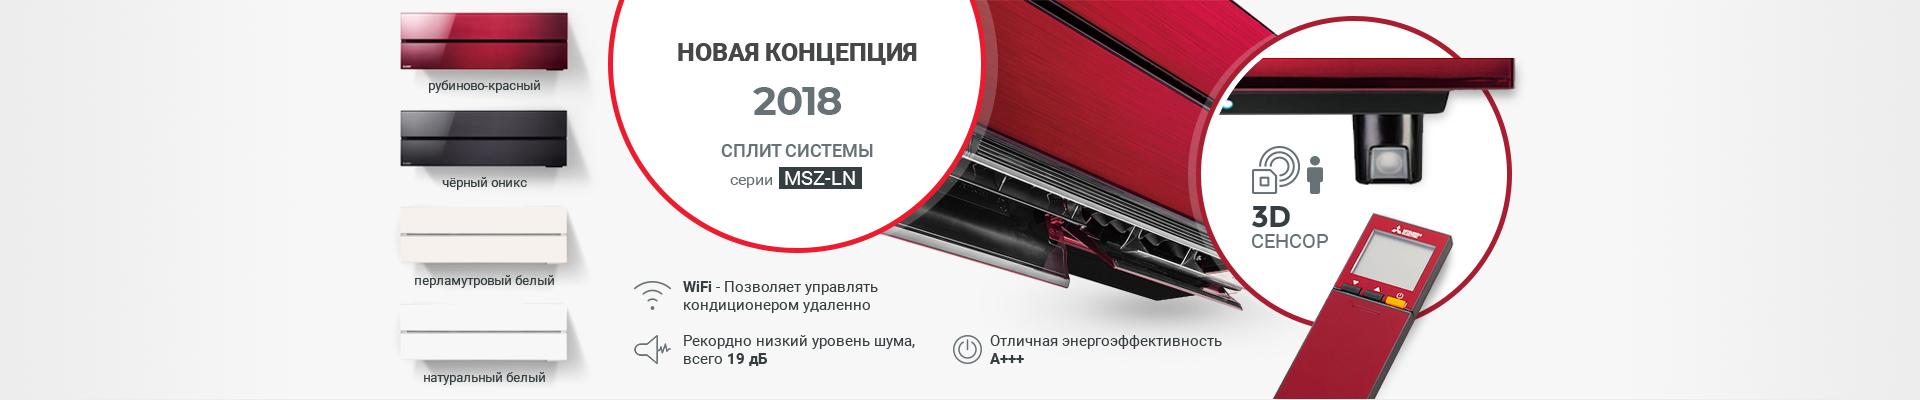 mem-2018.png